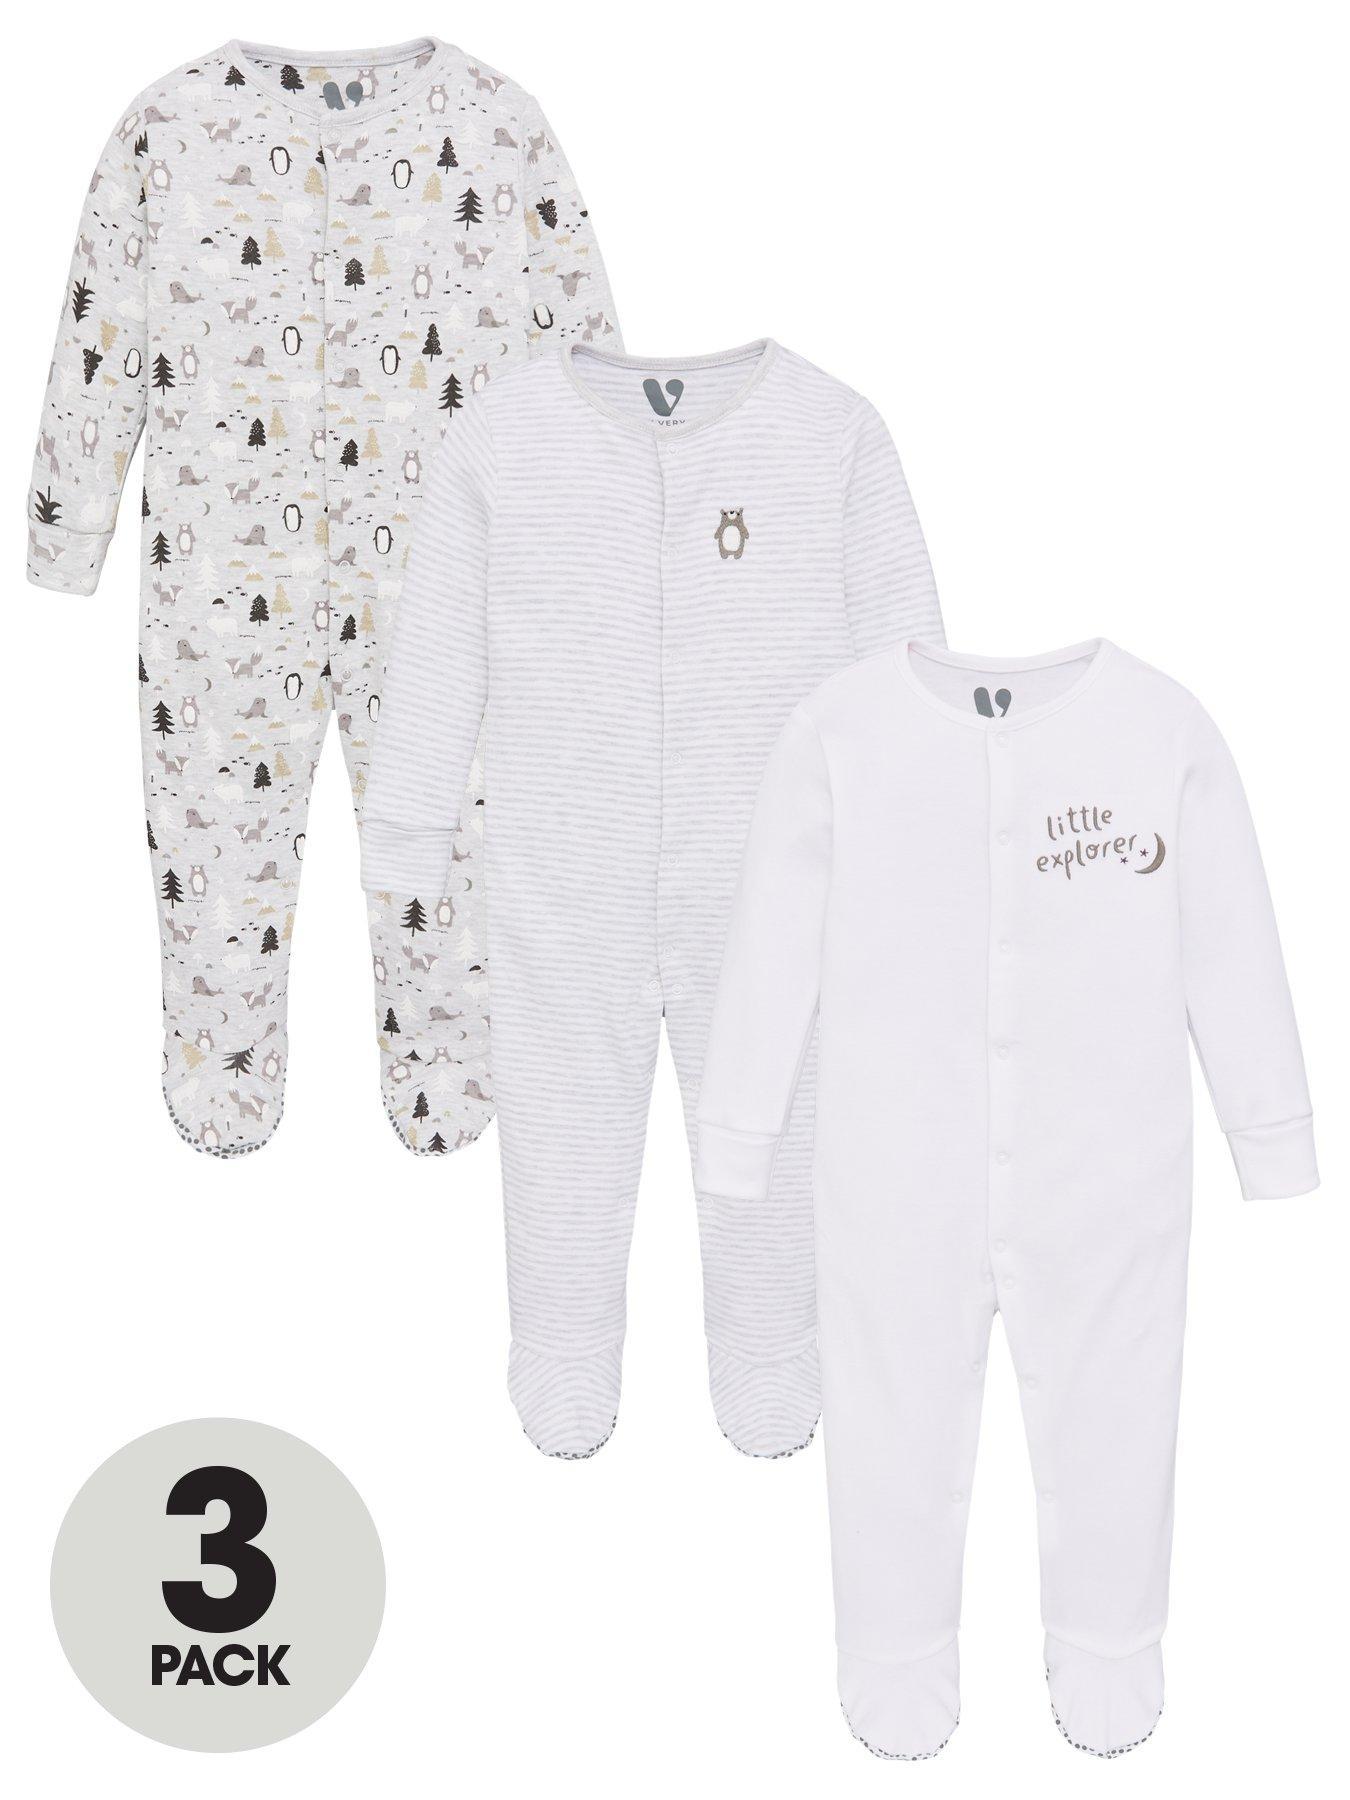 DREAM 0-3 3-6 6-9 BABY BOYS CHOO TRAIN BABYGROW SLEEPSUIT MULTI OR REBORN DOLLS